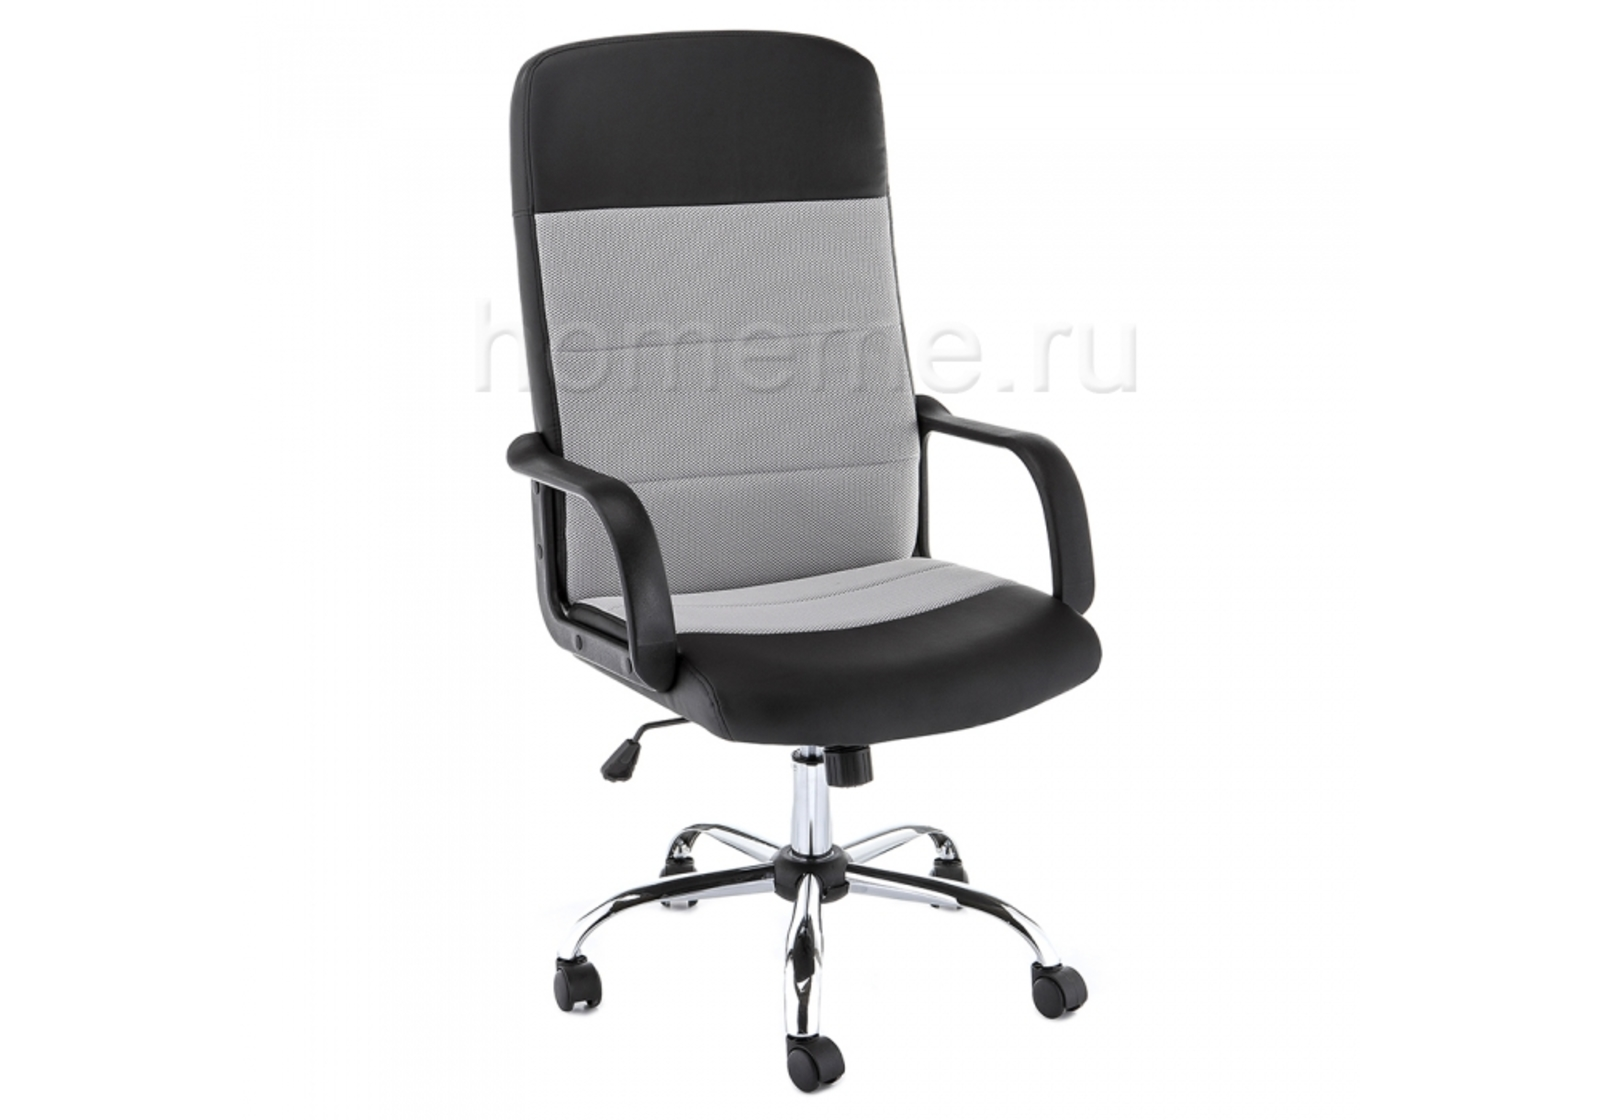 Кресло для офиса HomeMe Prosto черное 11283 от Homeme.ru